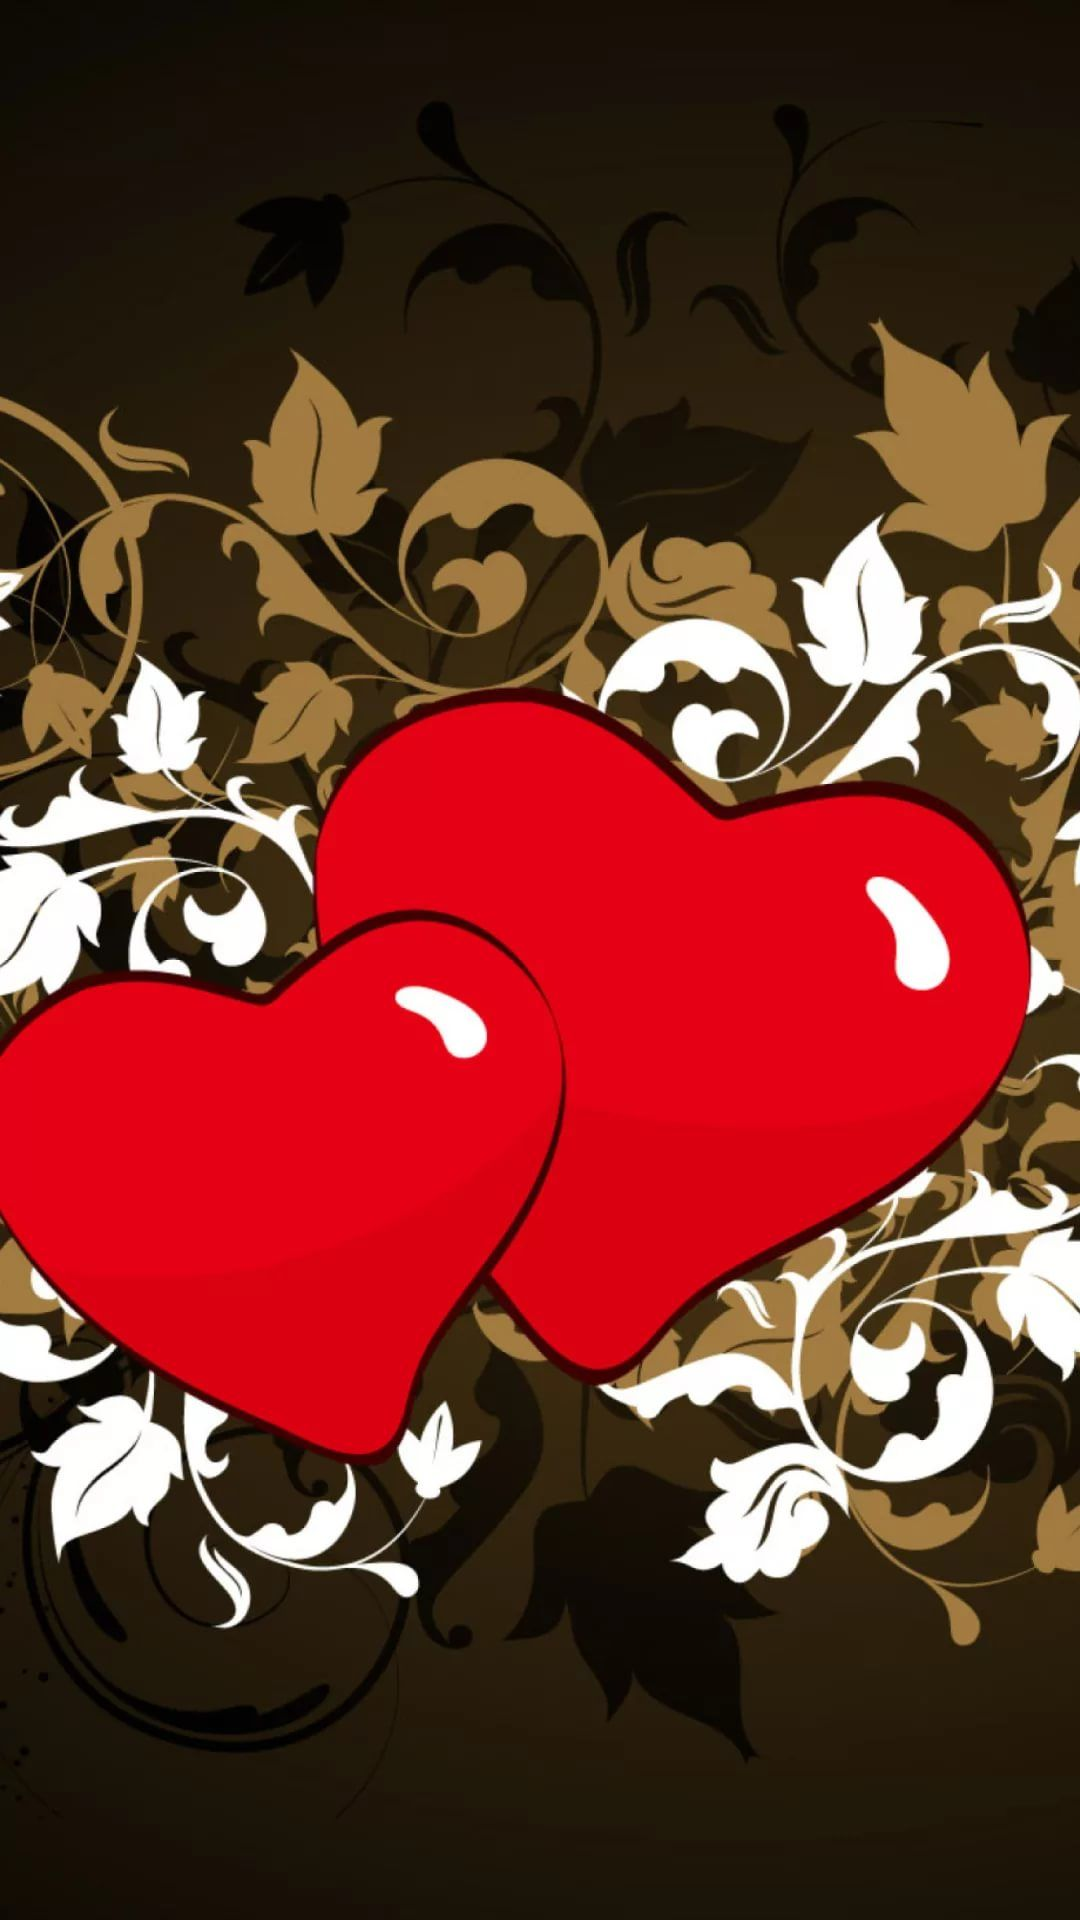 Valentine's Day phone wallpaper